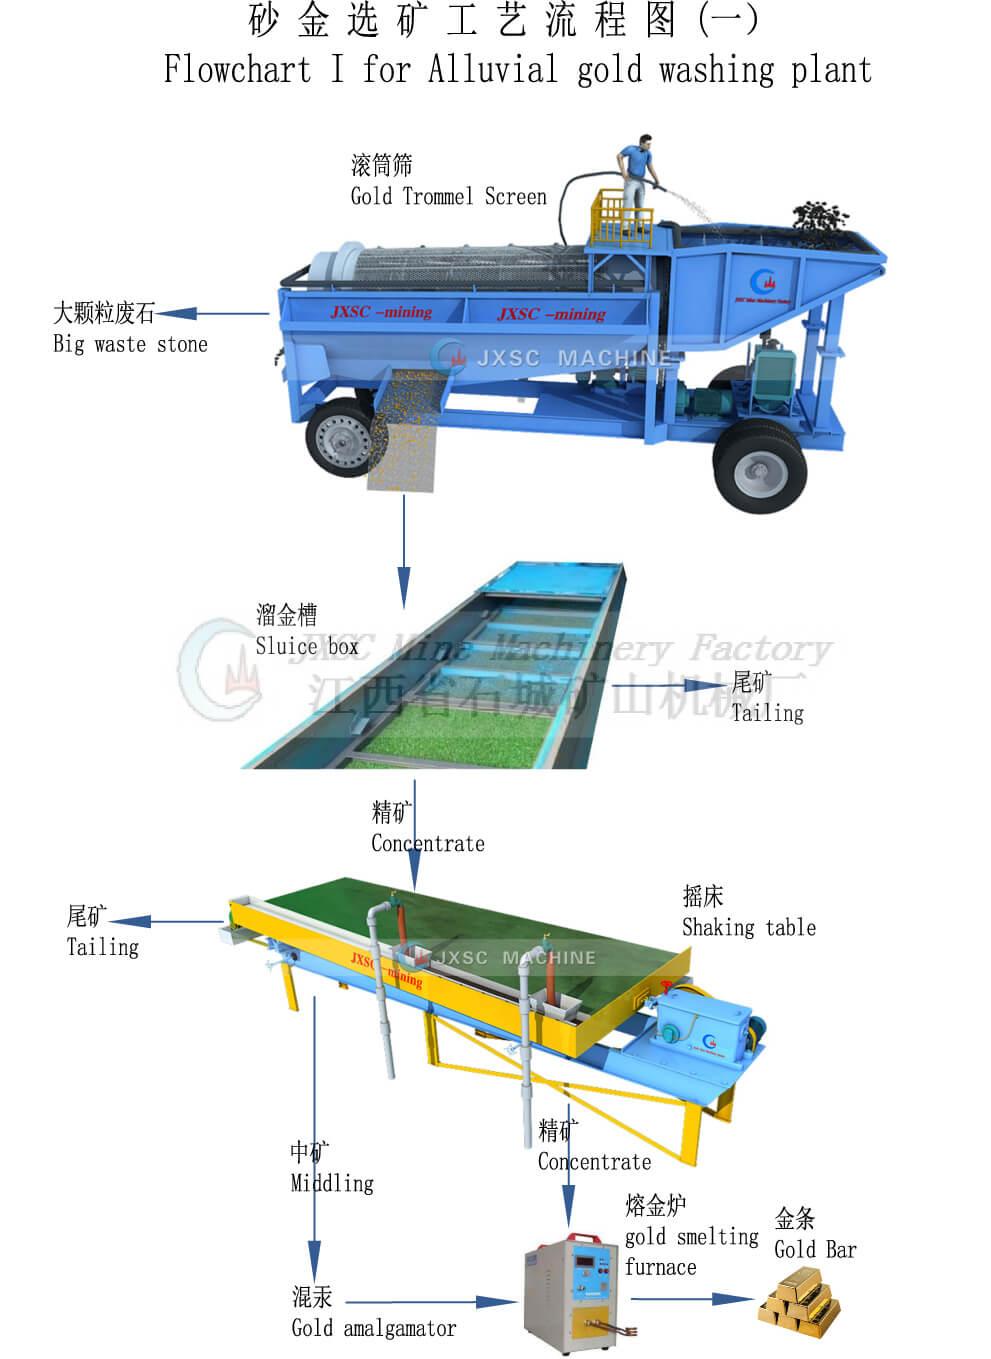 Alluvial gold washing plant %E4%B8%80%EF%BC%89 alluvial gold washing plant solution jiangxi shicheng mine